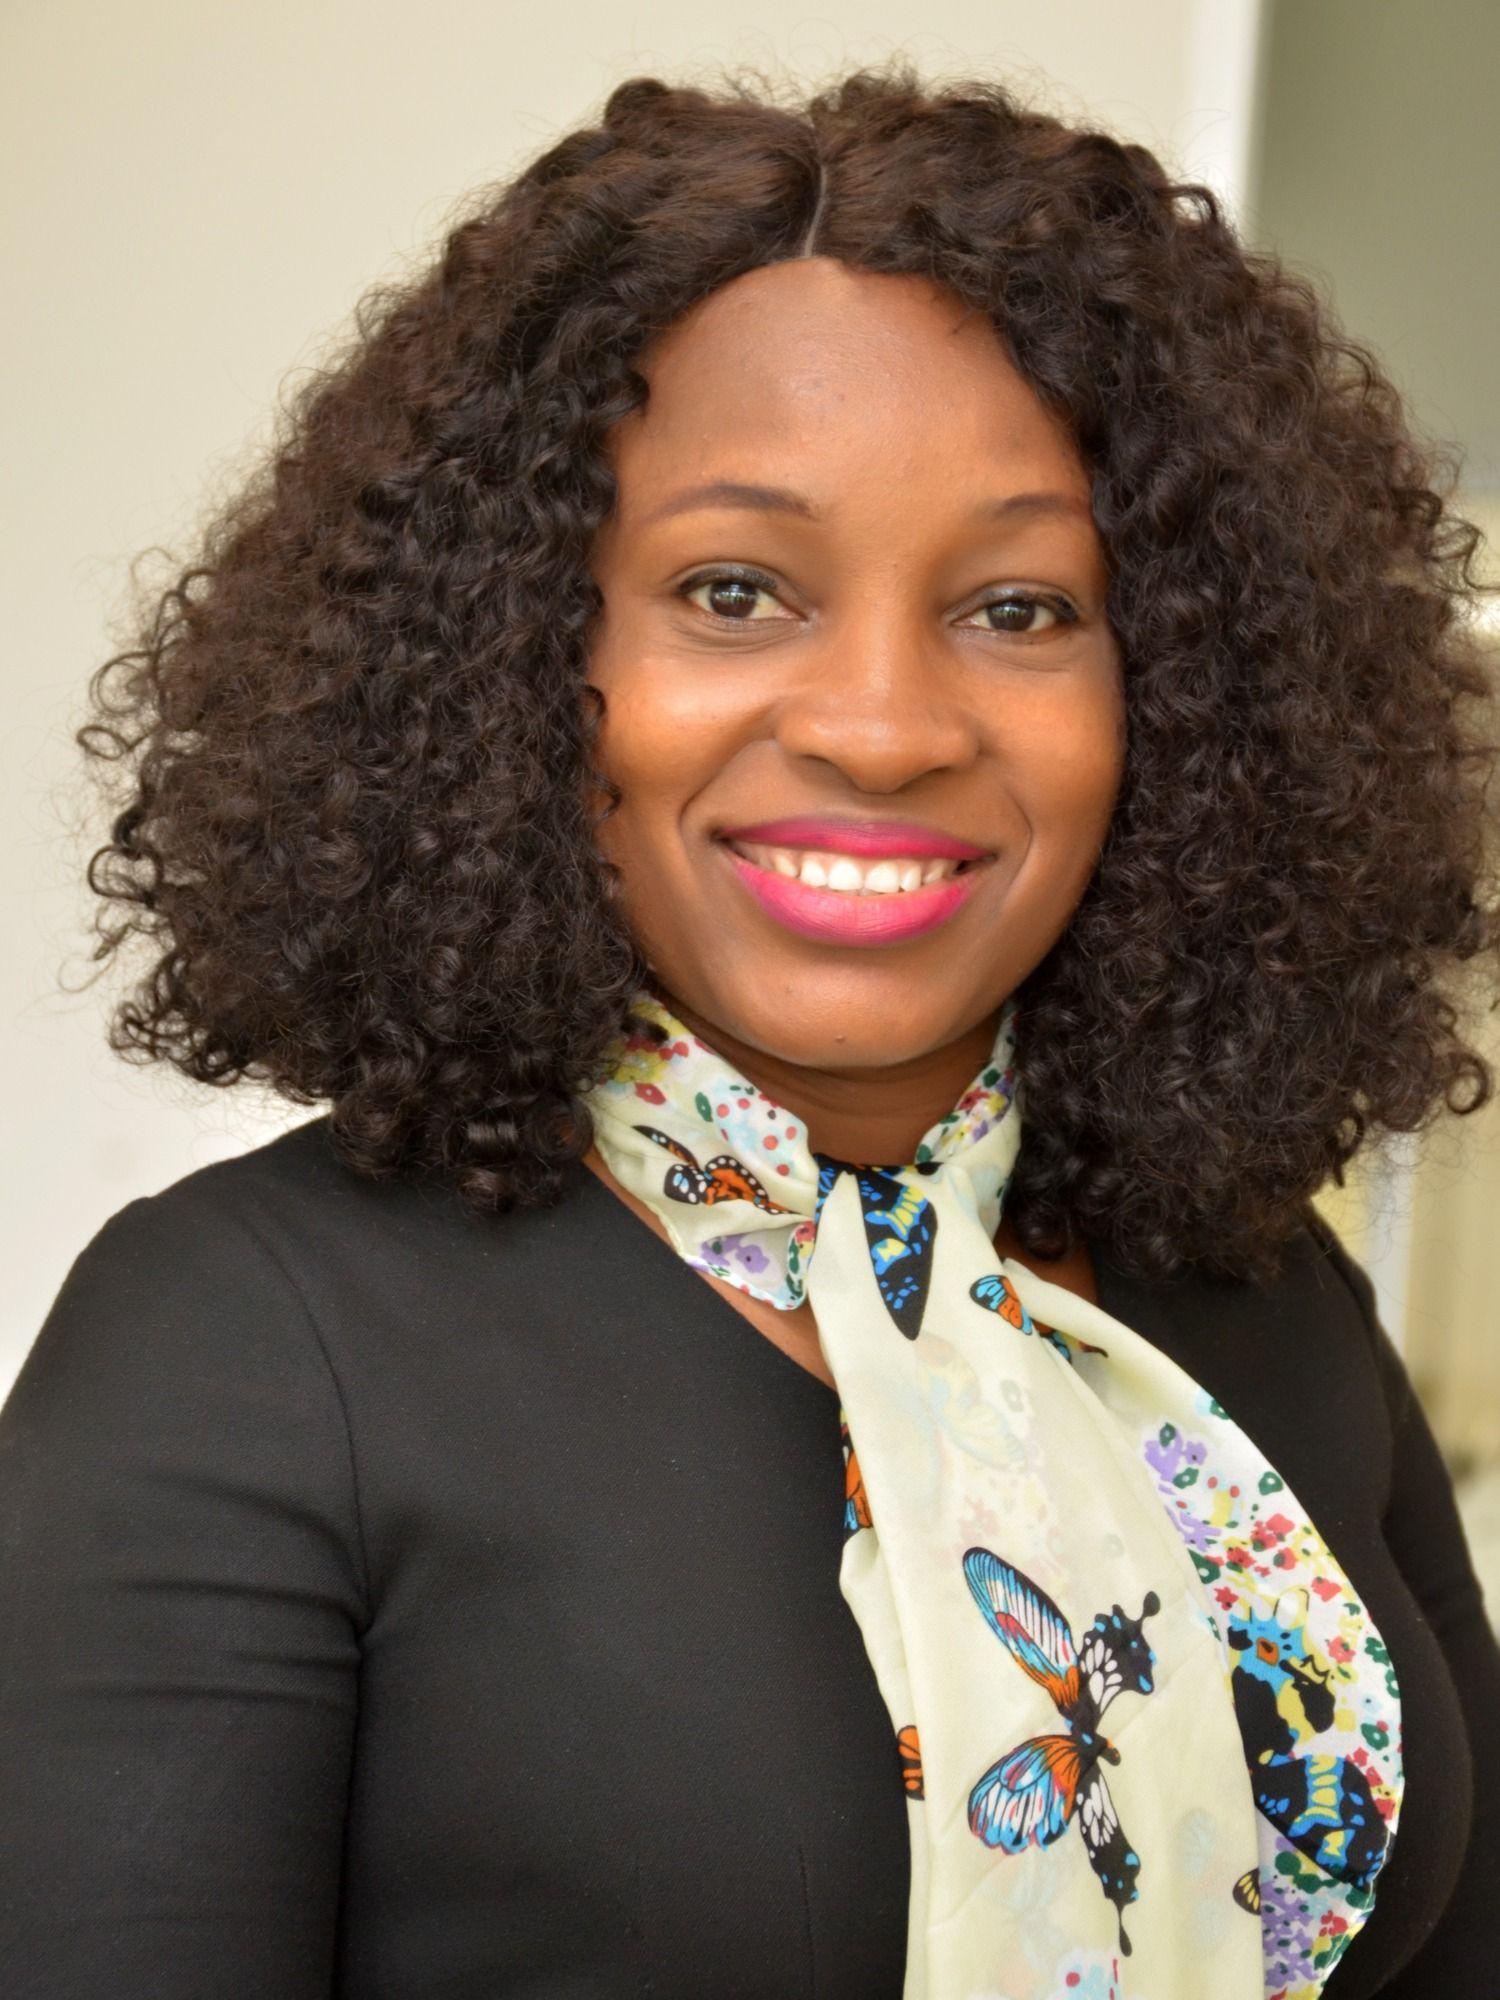 Rosemond Egbosi